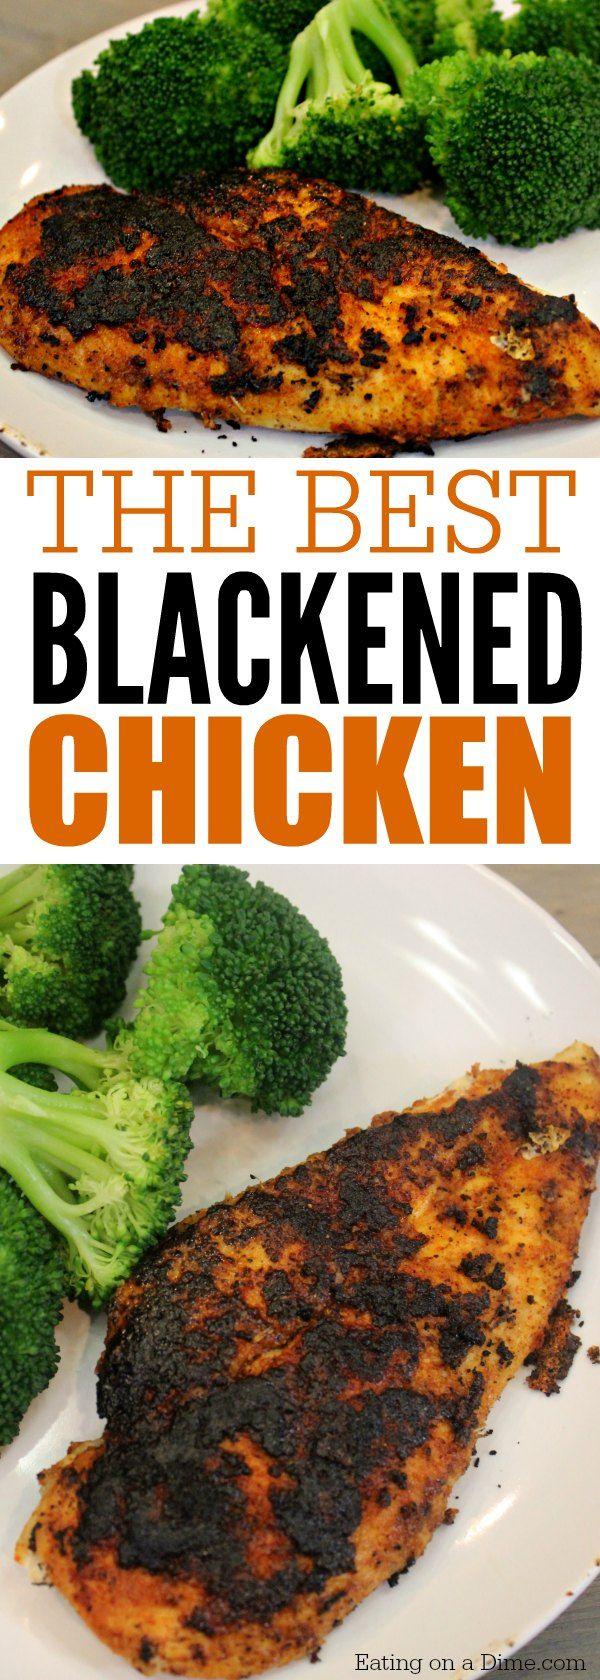 Best blackened chicken recipe - how to make blackened chicken